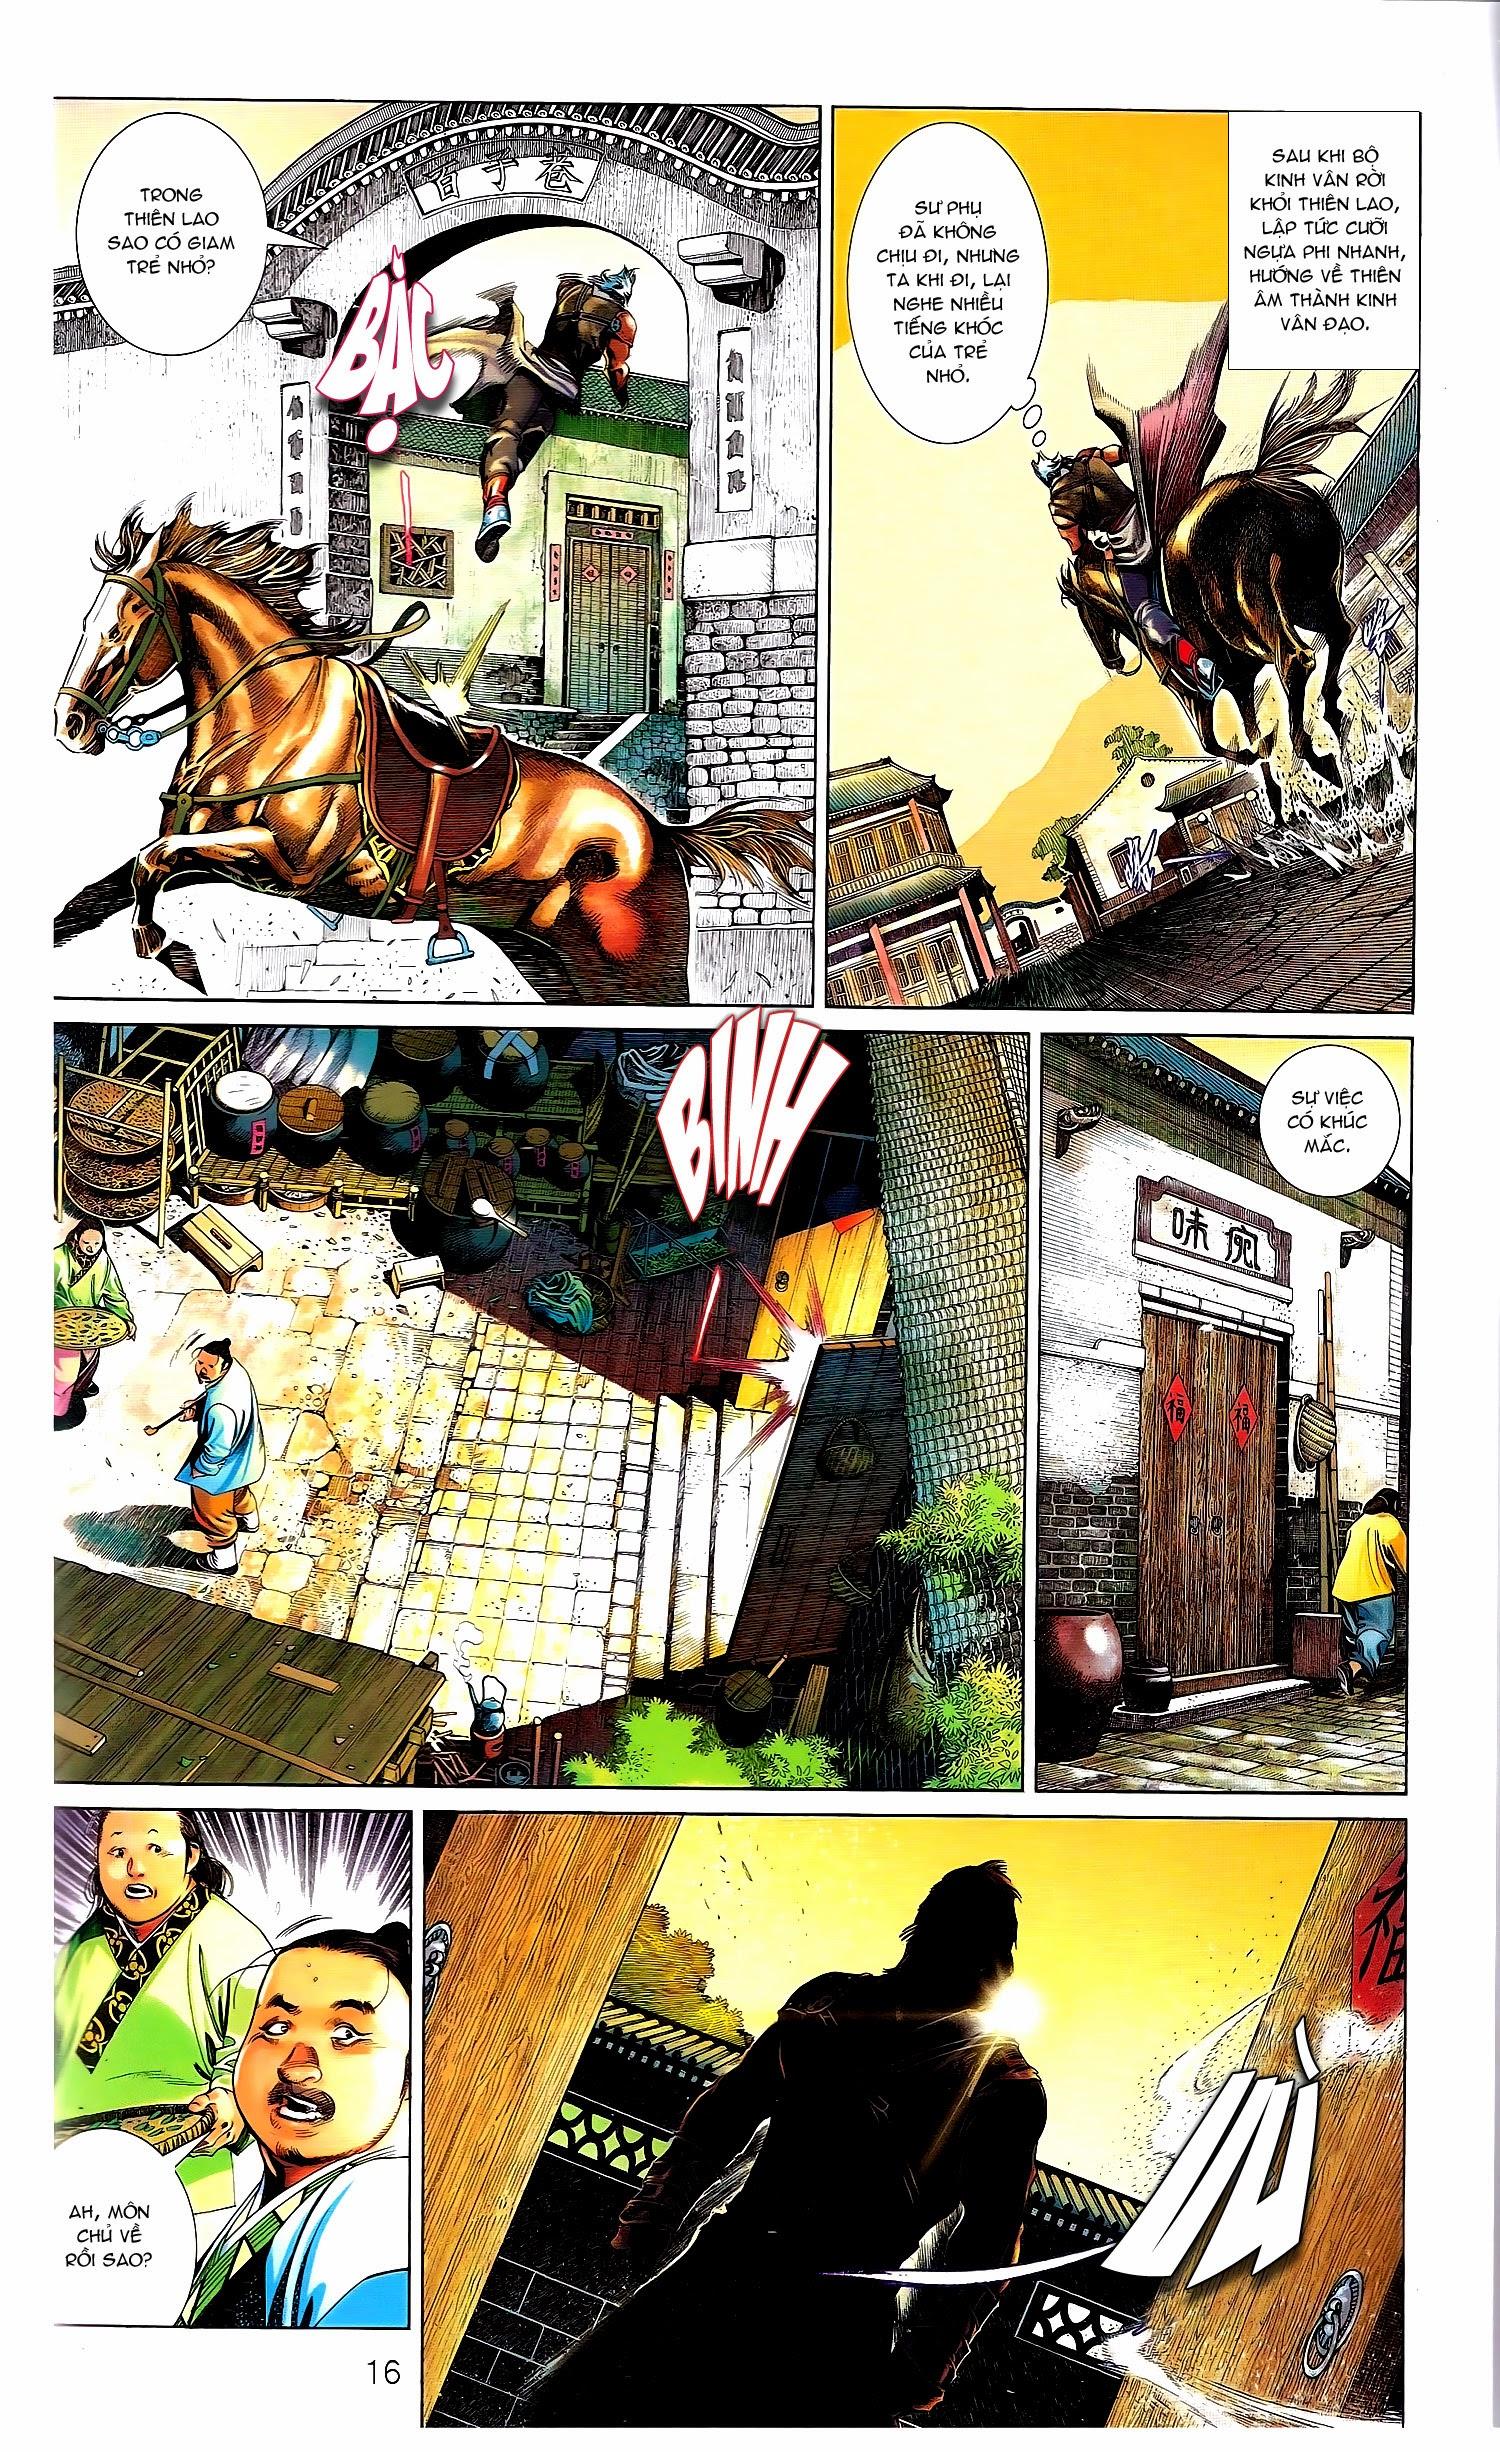 Phong Vân chap 671A Trang 16 - Mangak.info